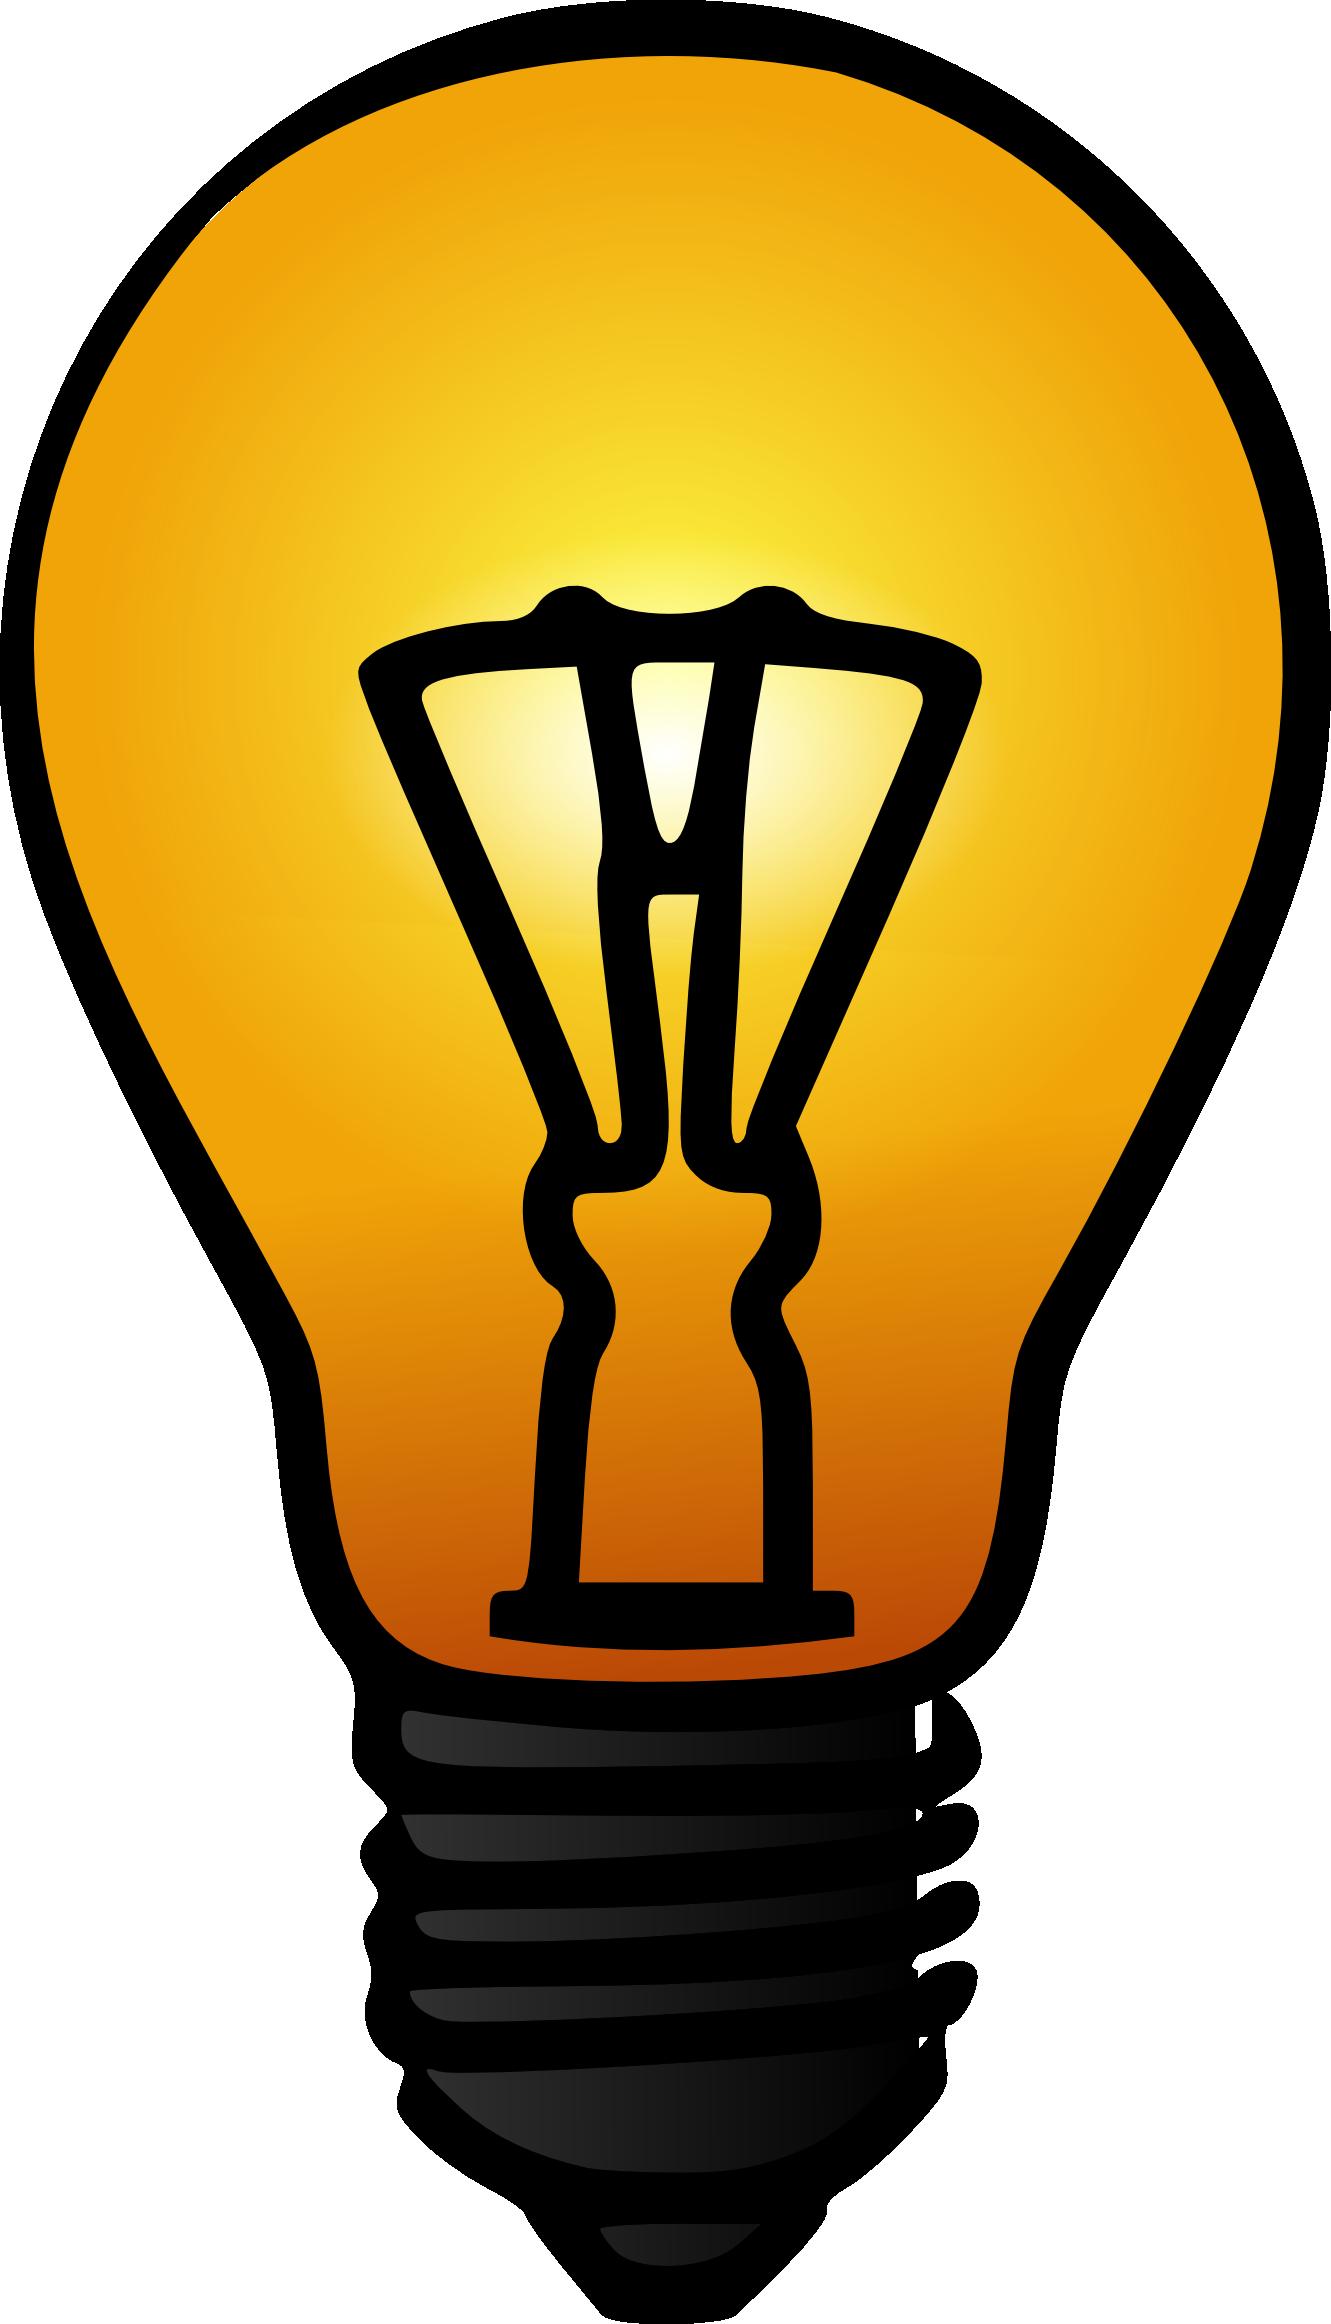 1331x2324 Bulb Lamp Clip Art At Clker Com Vector Online Royalty Light